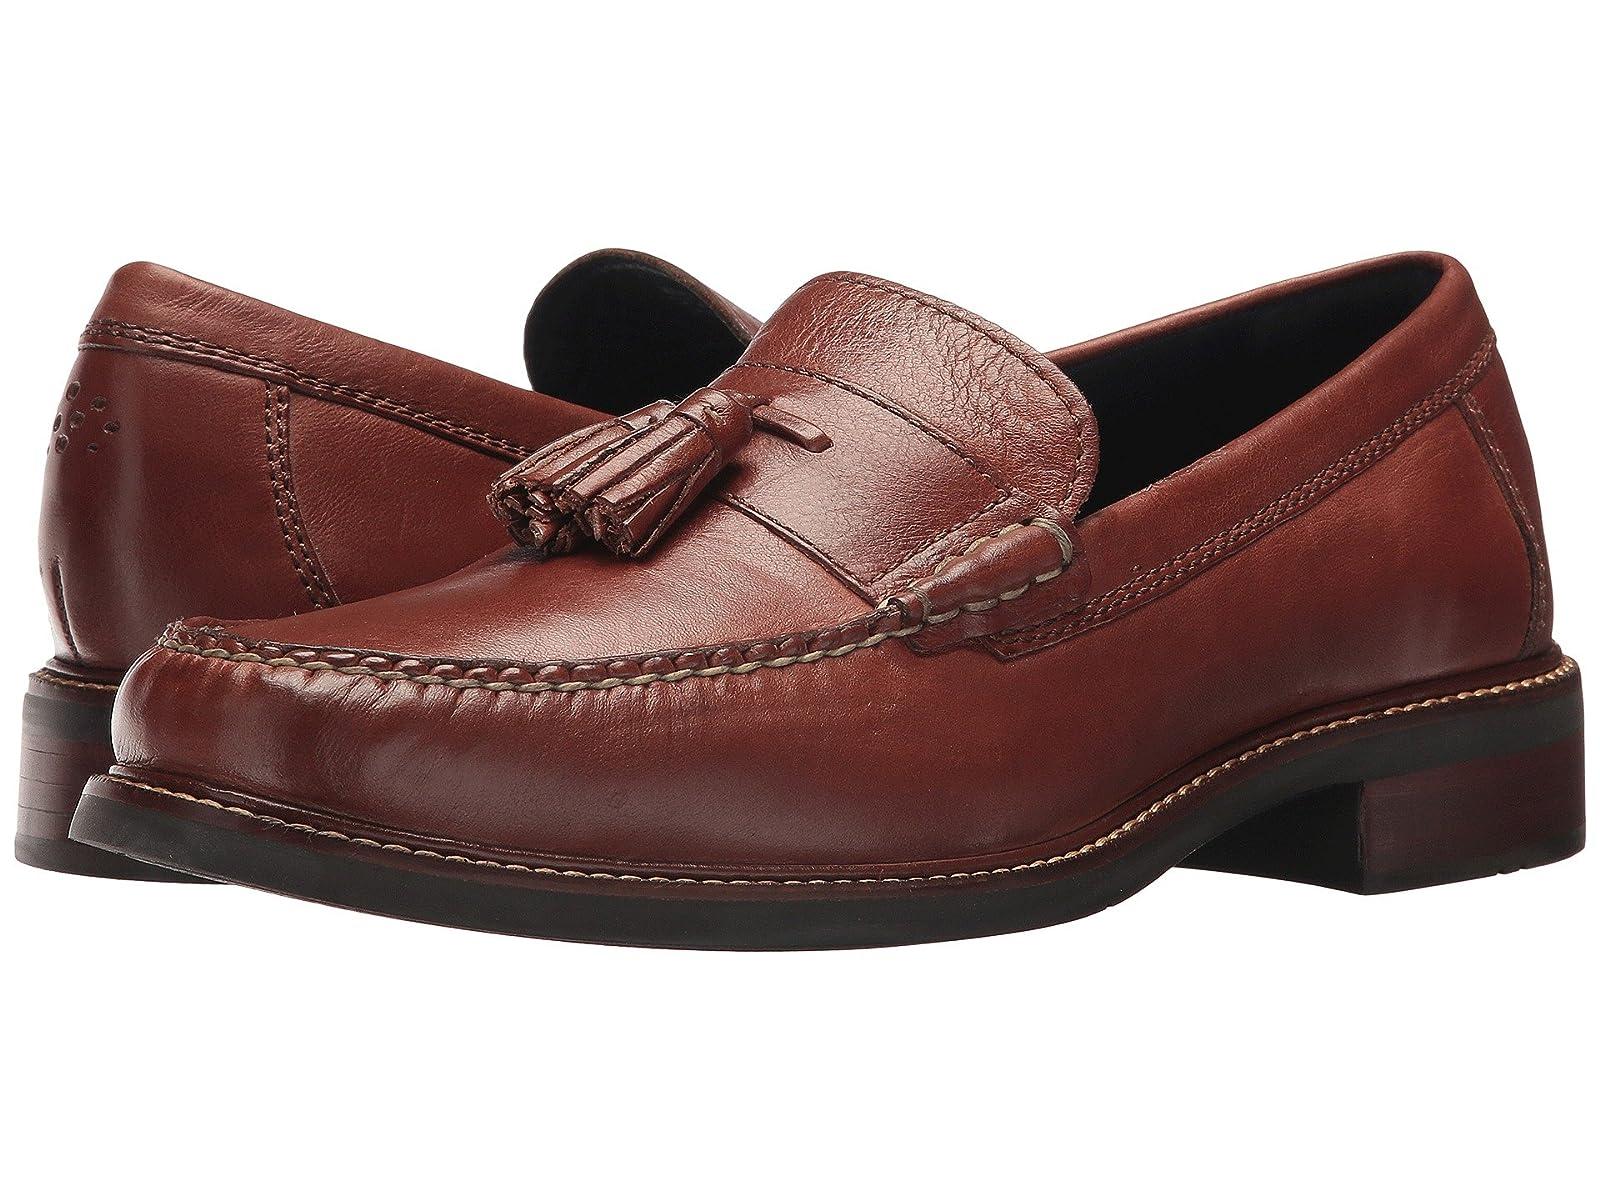 Cole Haan Pinch Sanford Tassel LoaferCheap and distinctive eye-catching shoes